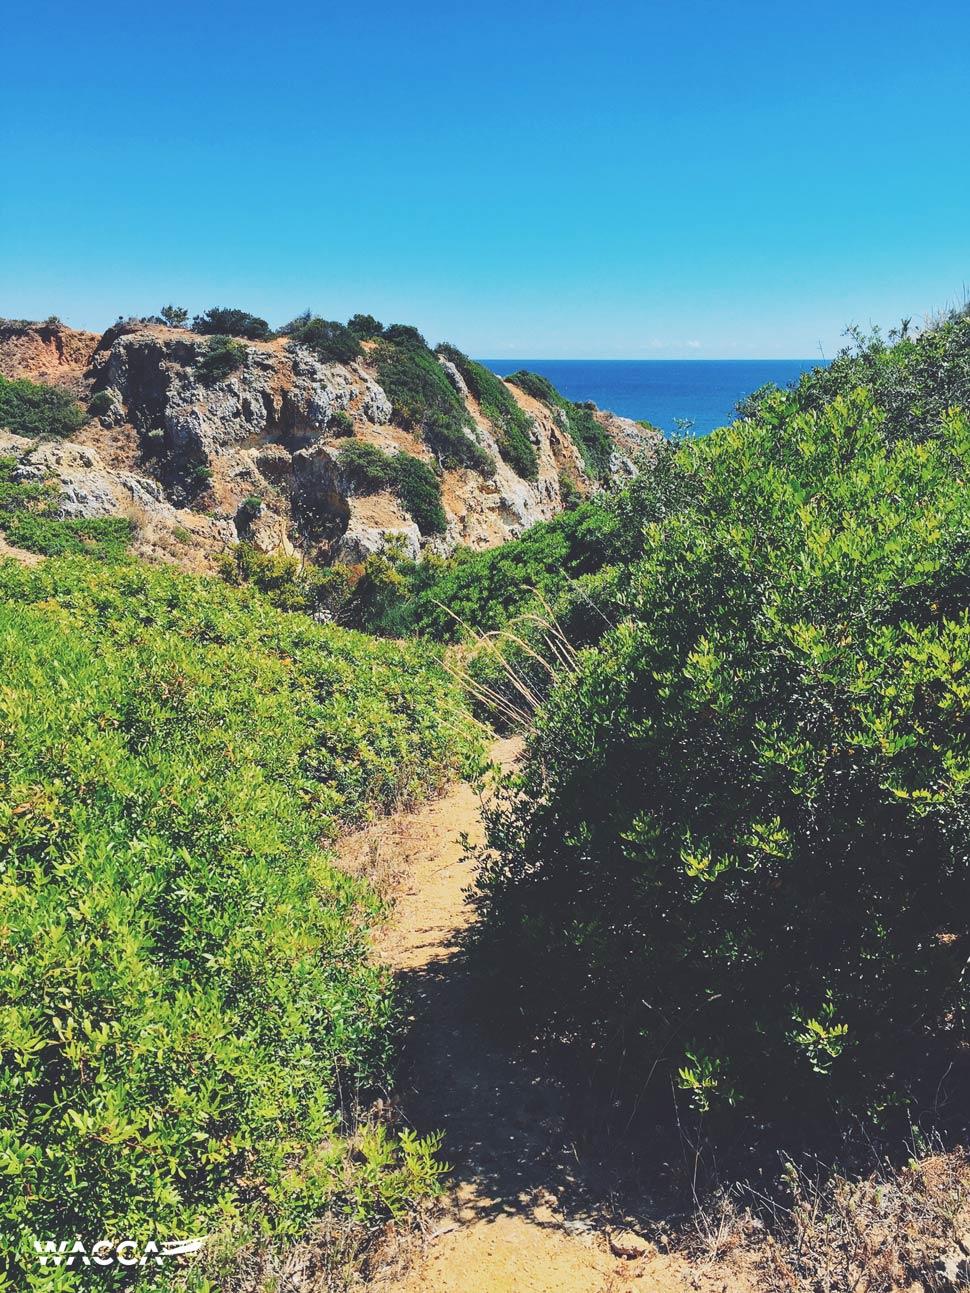 portugal-algarve-lagos-wacca-03